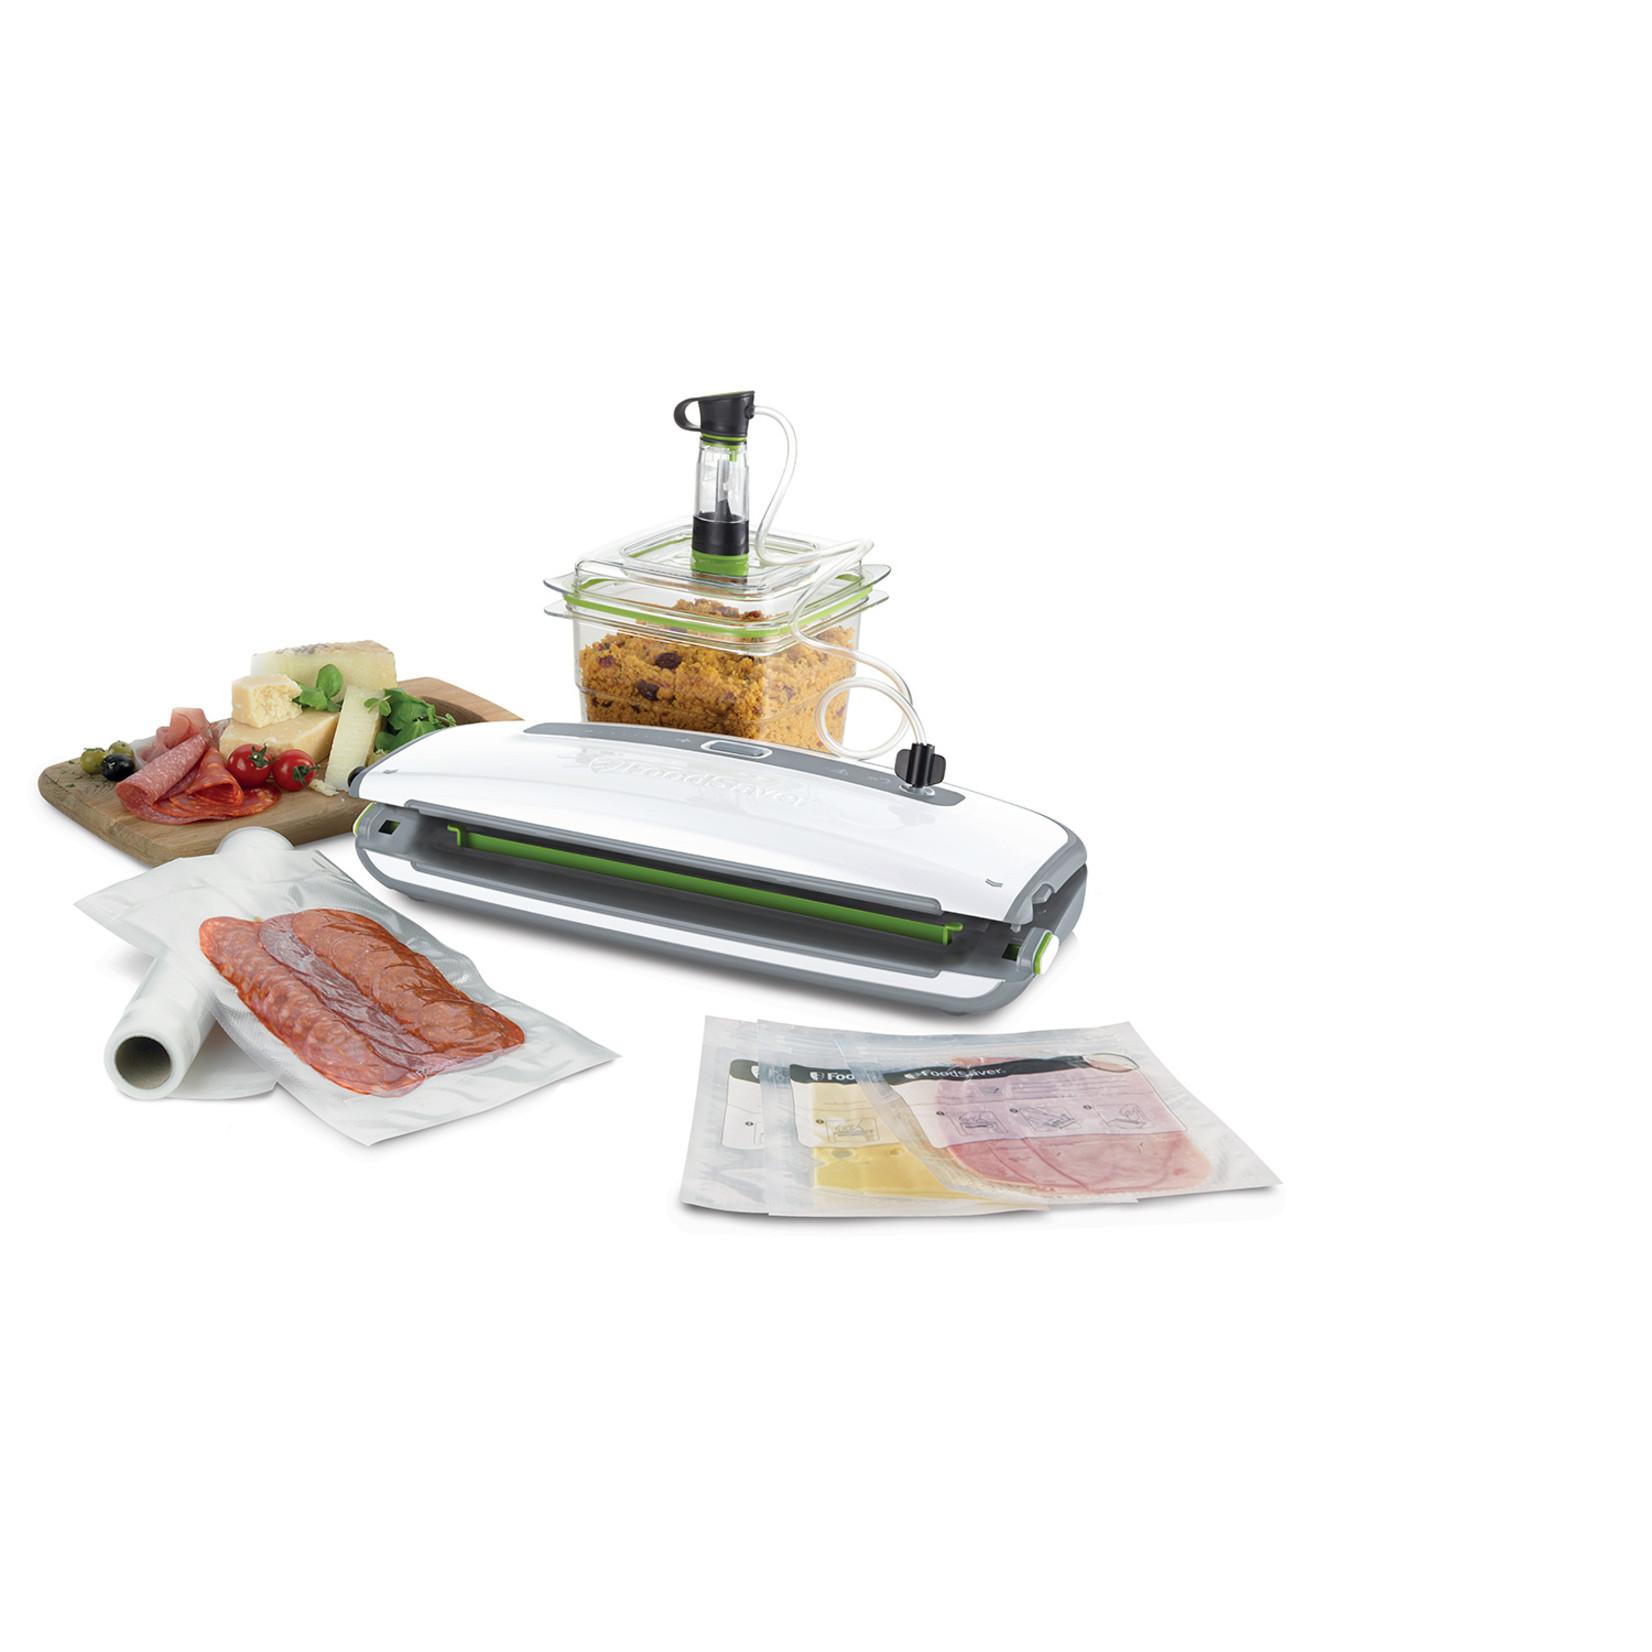 Foodsaver FoodSaver Urban FSV014 Vacumeermachine